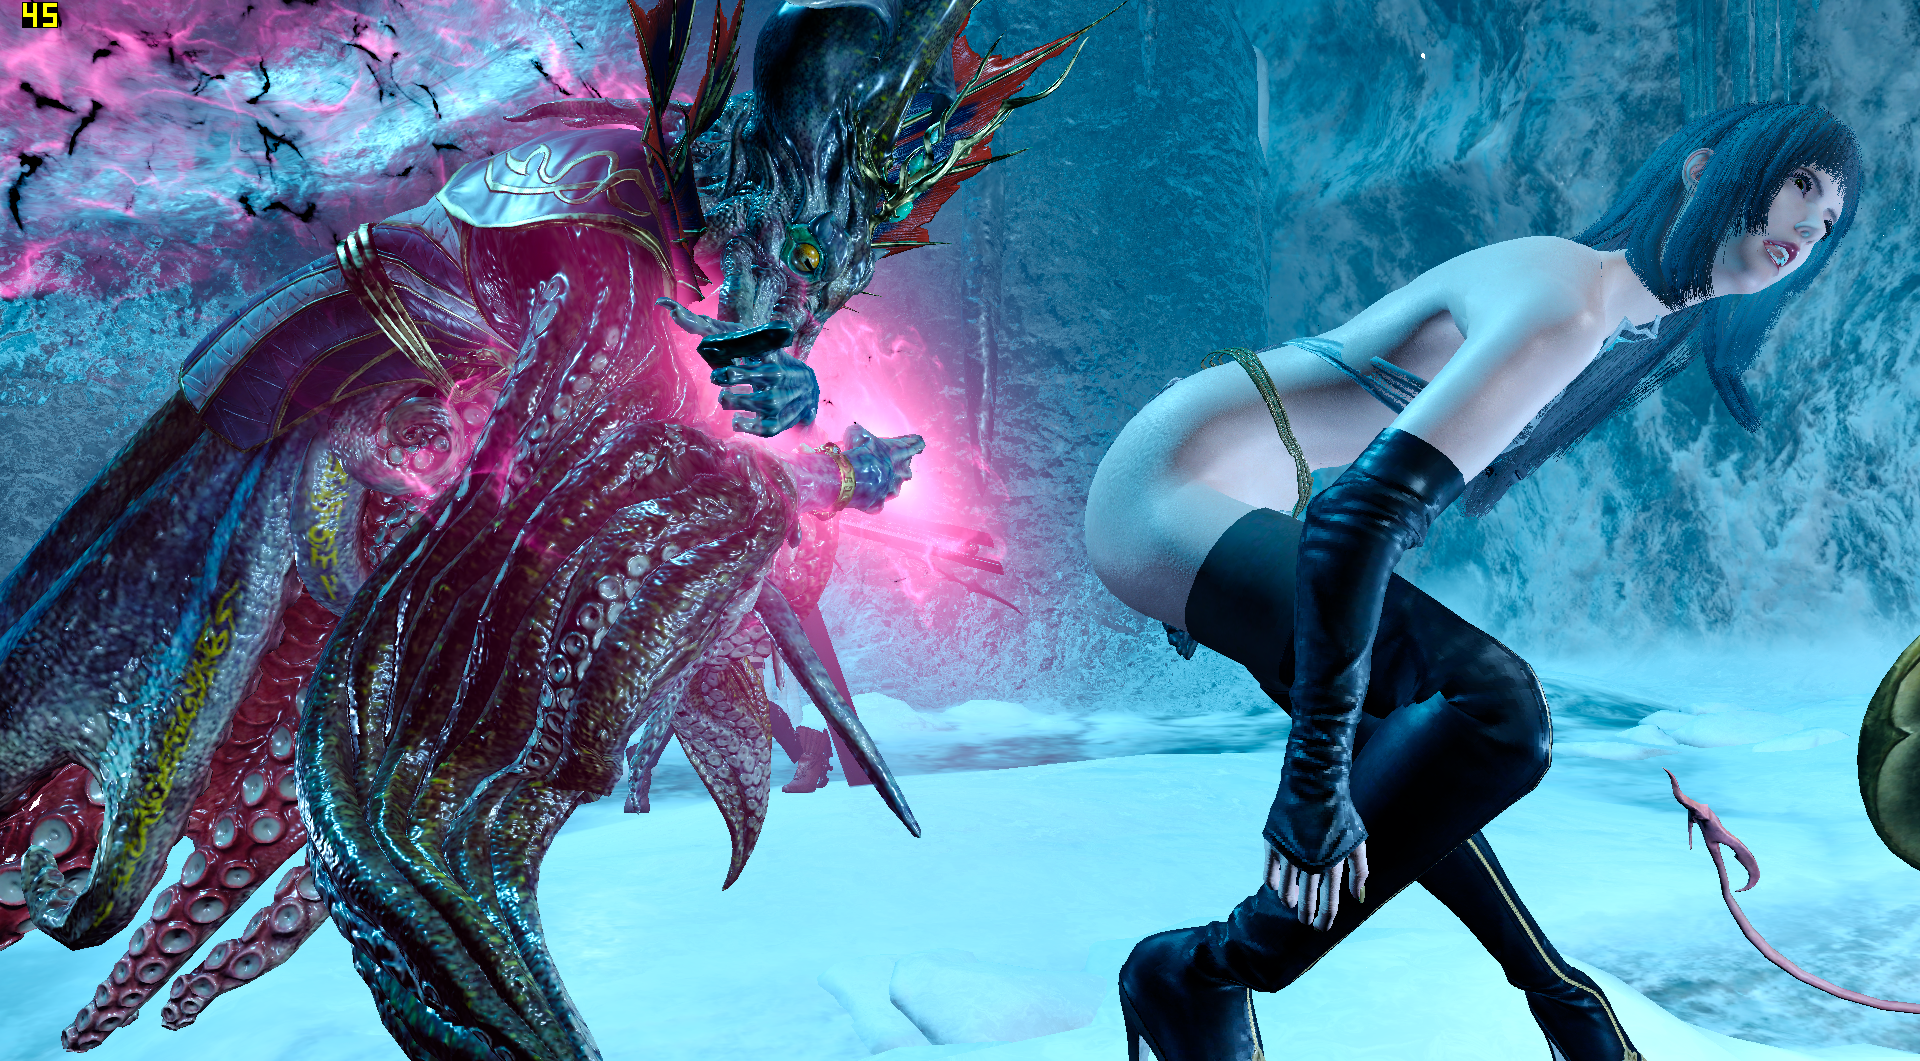 Final Fantasy XV Windows Edition Screenshot 2019.02.10 - 18.14.53.63.png